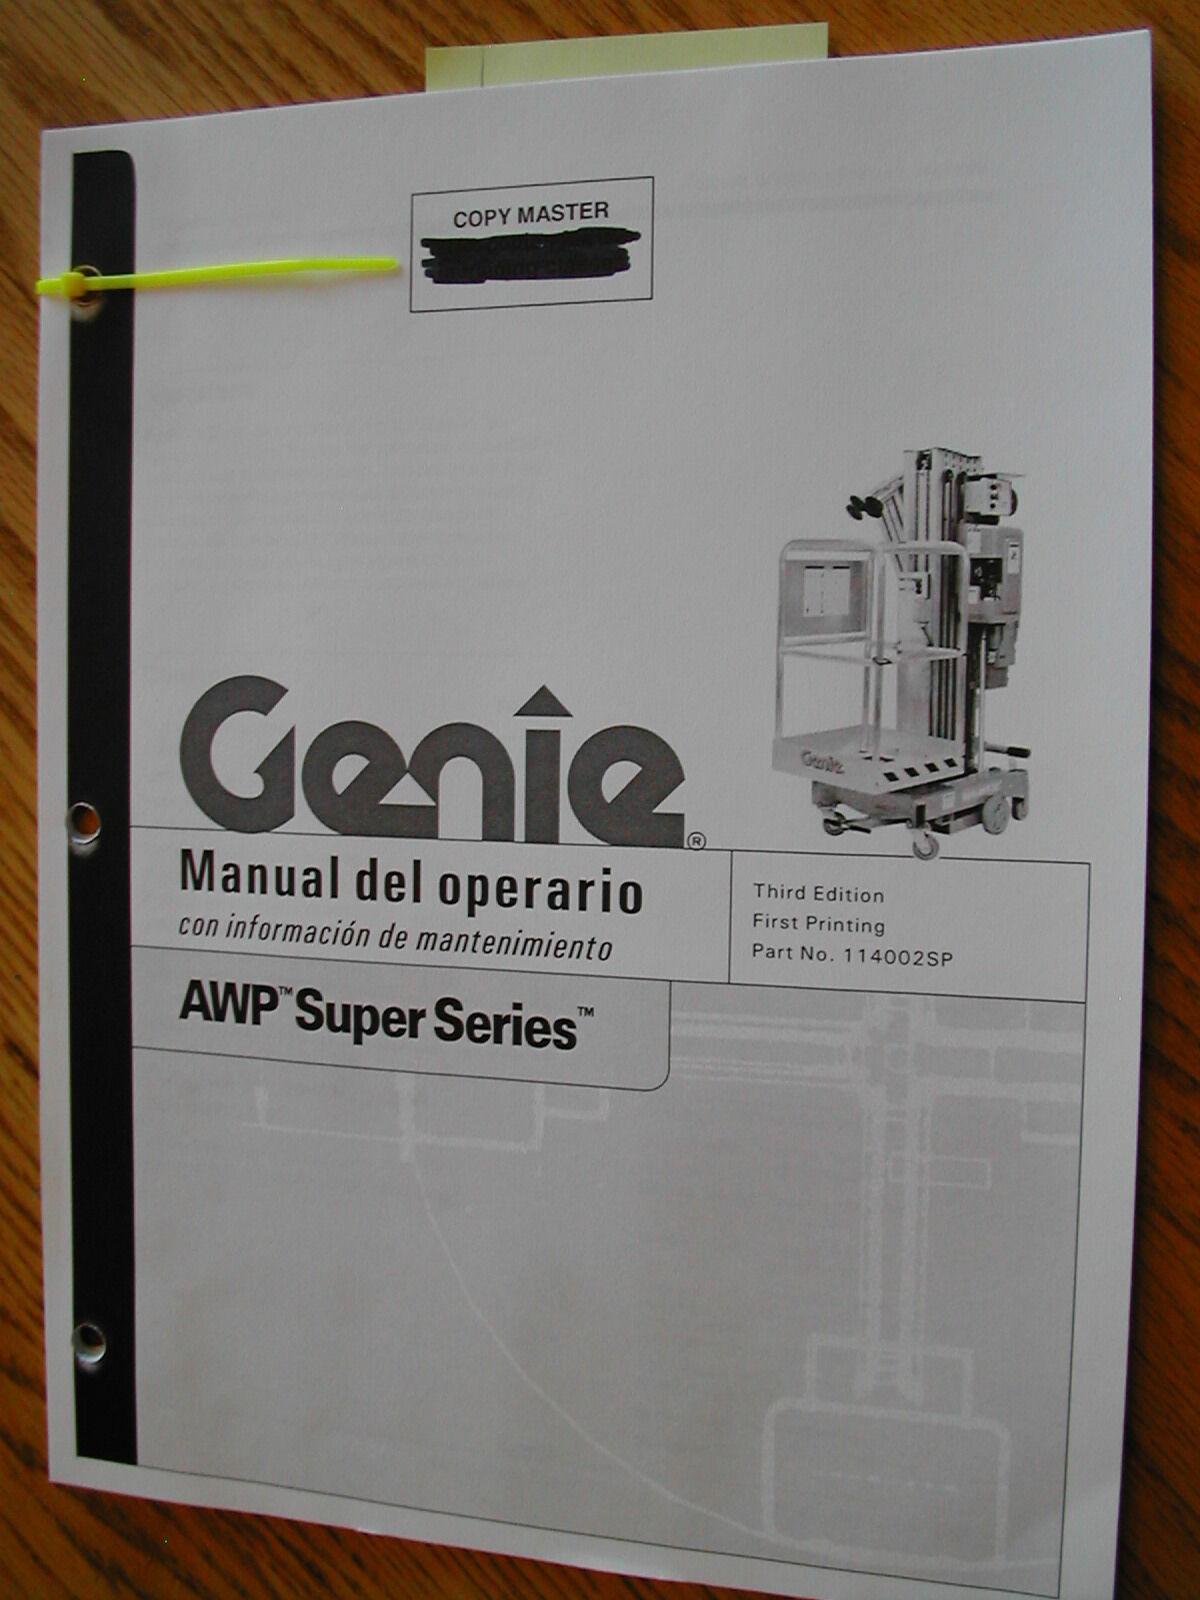 genie awp operators manual mast man lift operation maintenance rh ebay com Grove Manlift Parts Diagram Grove Manlift Parts